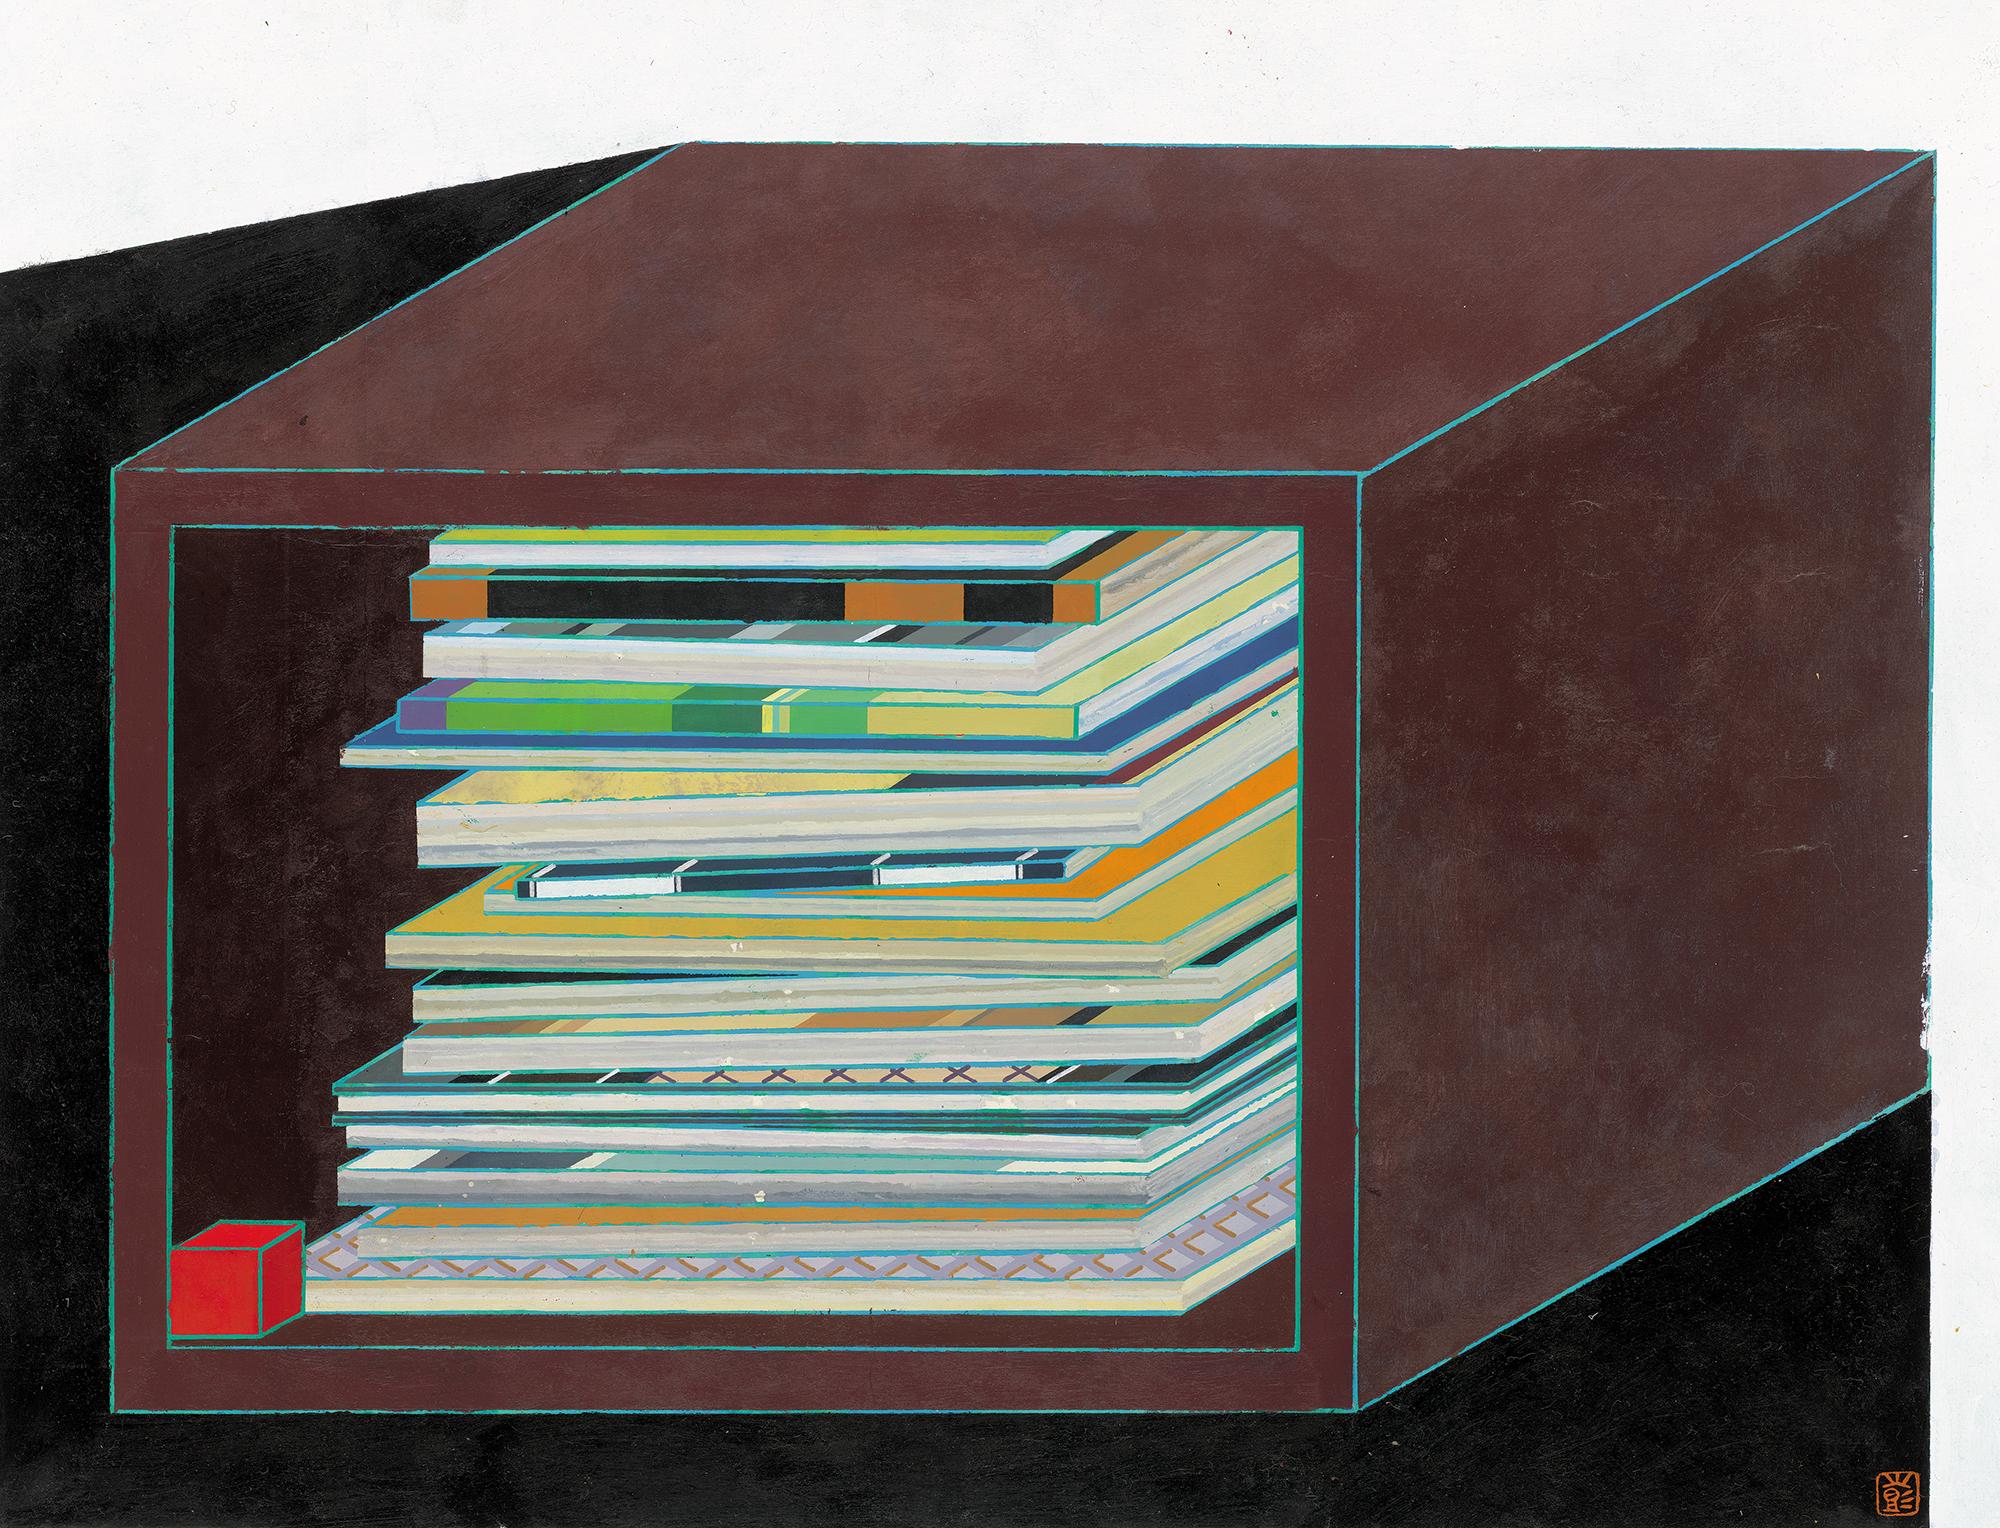 Peng Jian 彭剑, 局观, 2015, Ink and color on rice paper 纸本设色, 67 × 51 cm